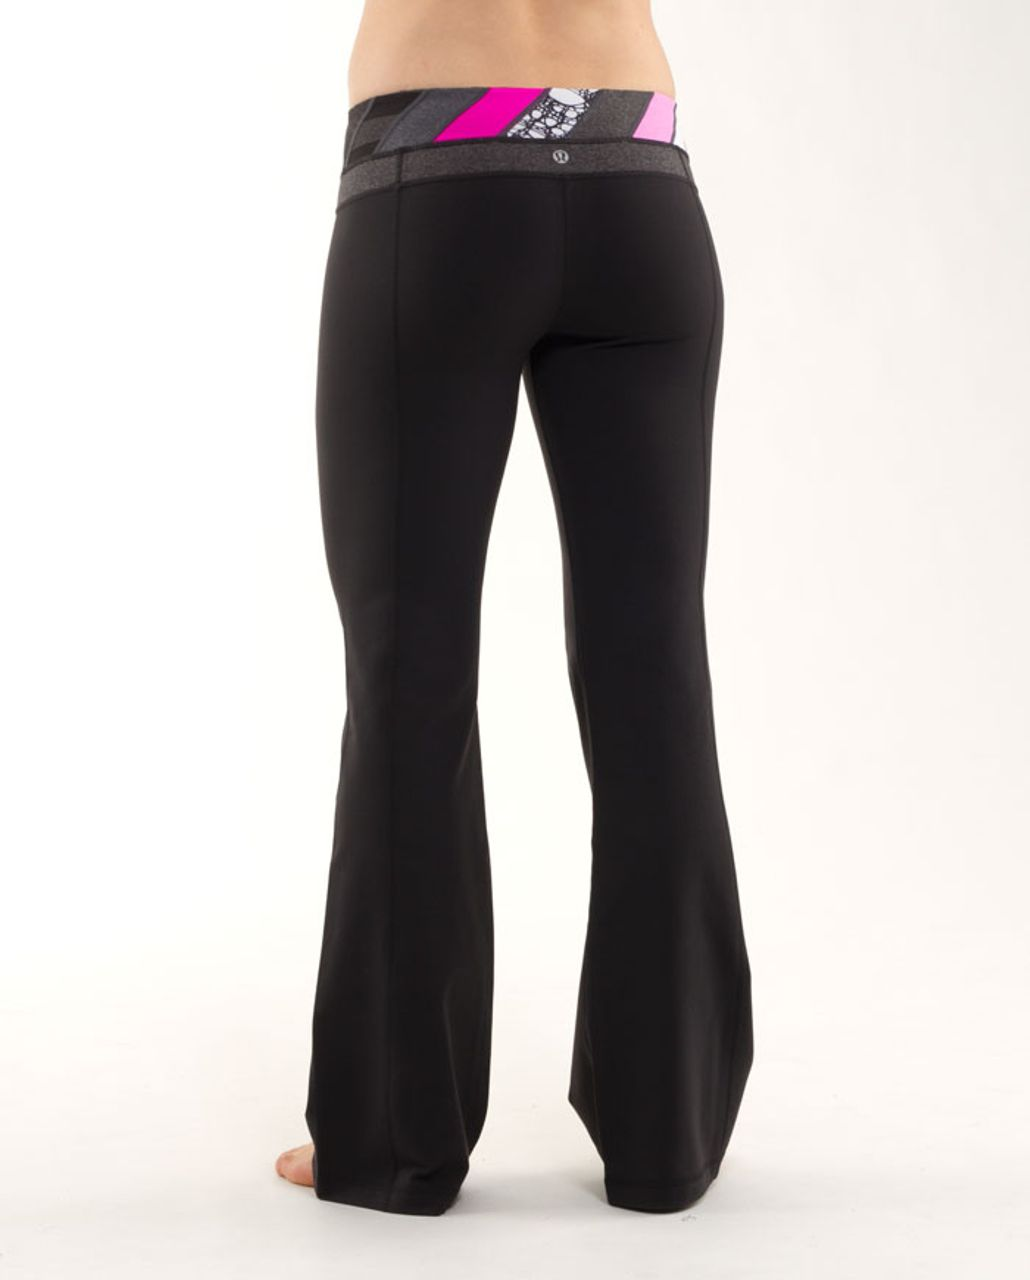 Lululemon Groove Pant (Regular) - Black /  Quilting Winter 7 /  Quilting Winter 7